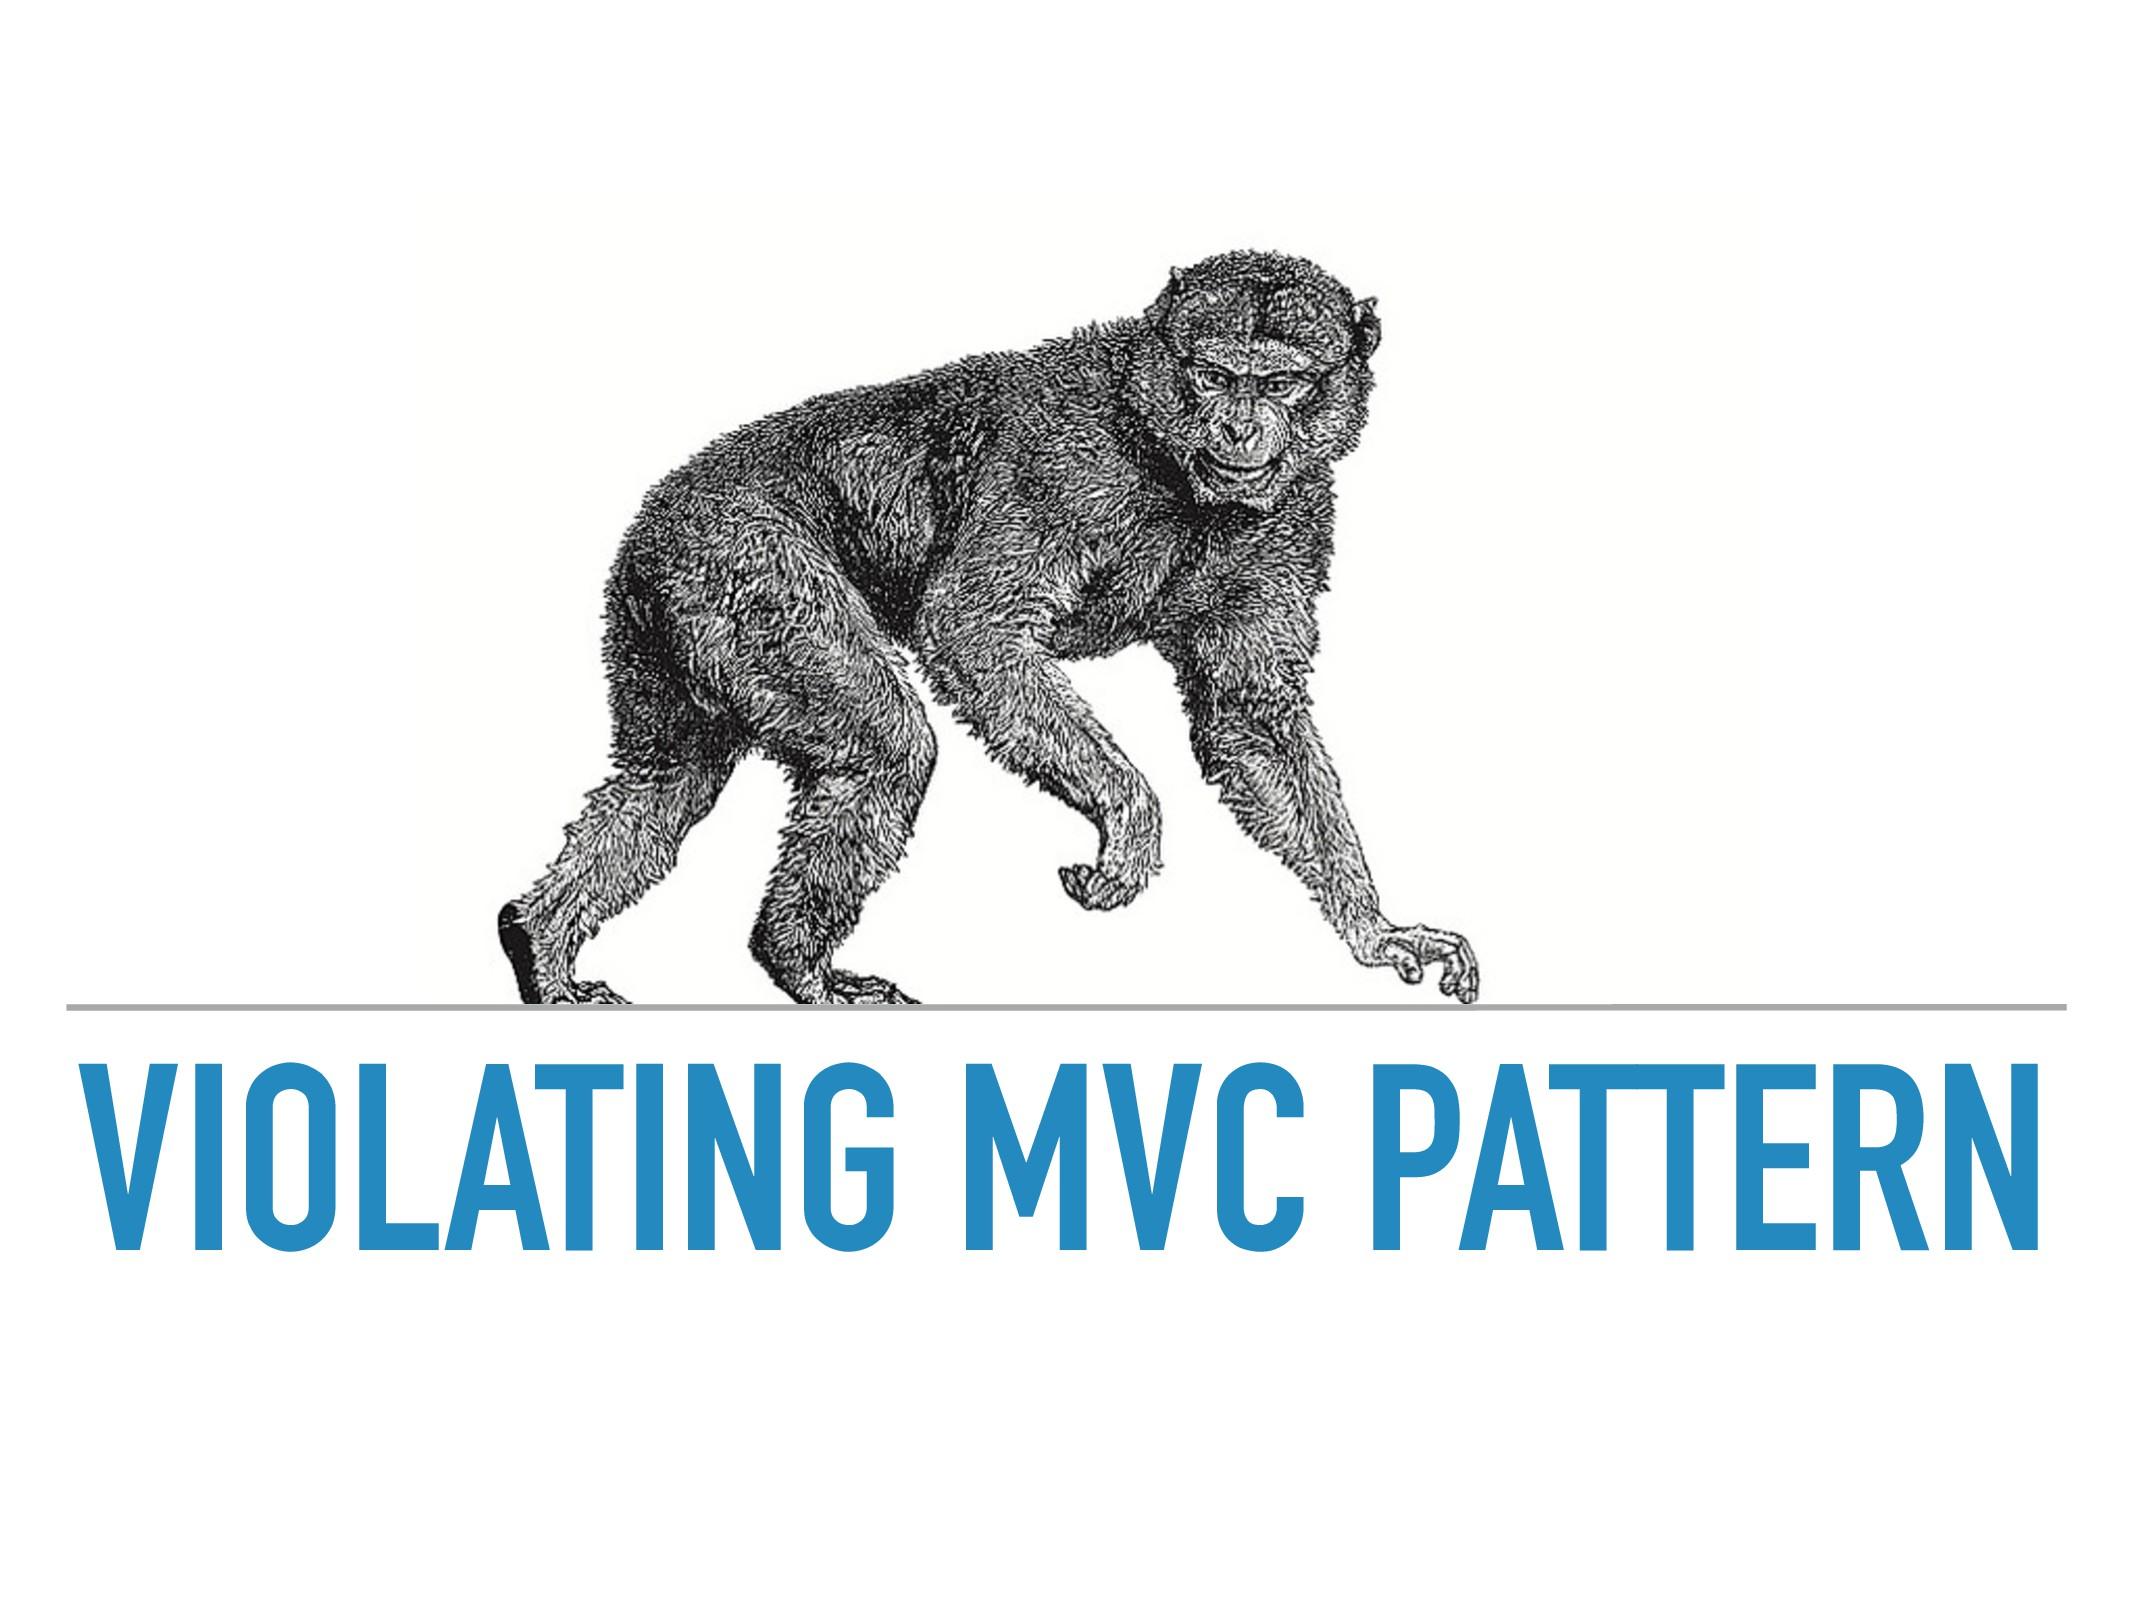 VIOLATING MVC PATTERN